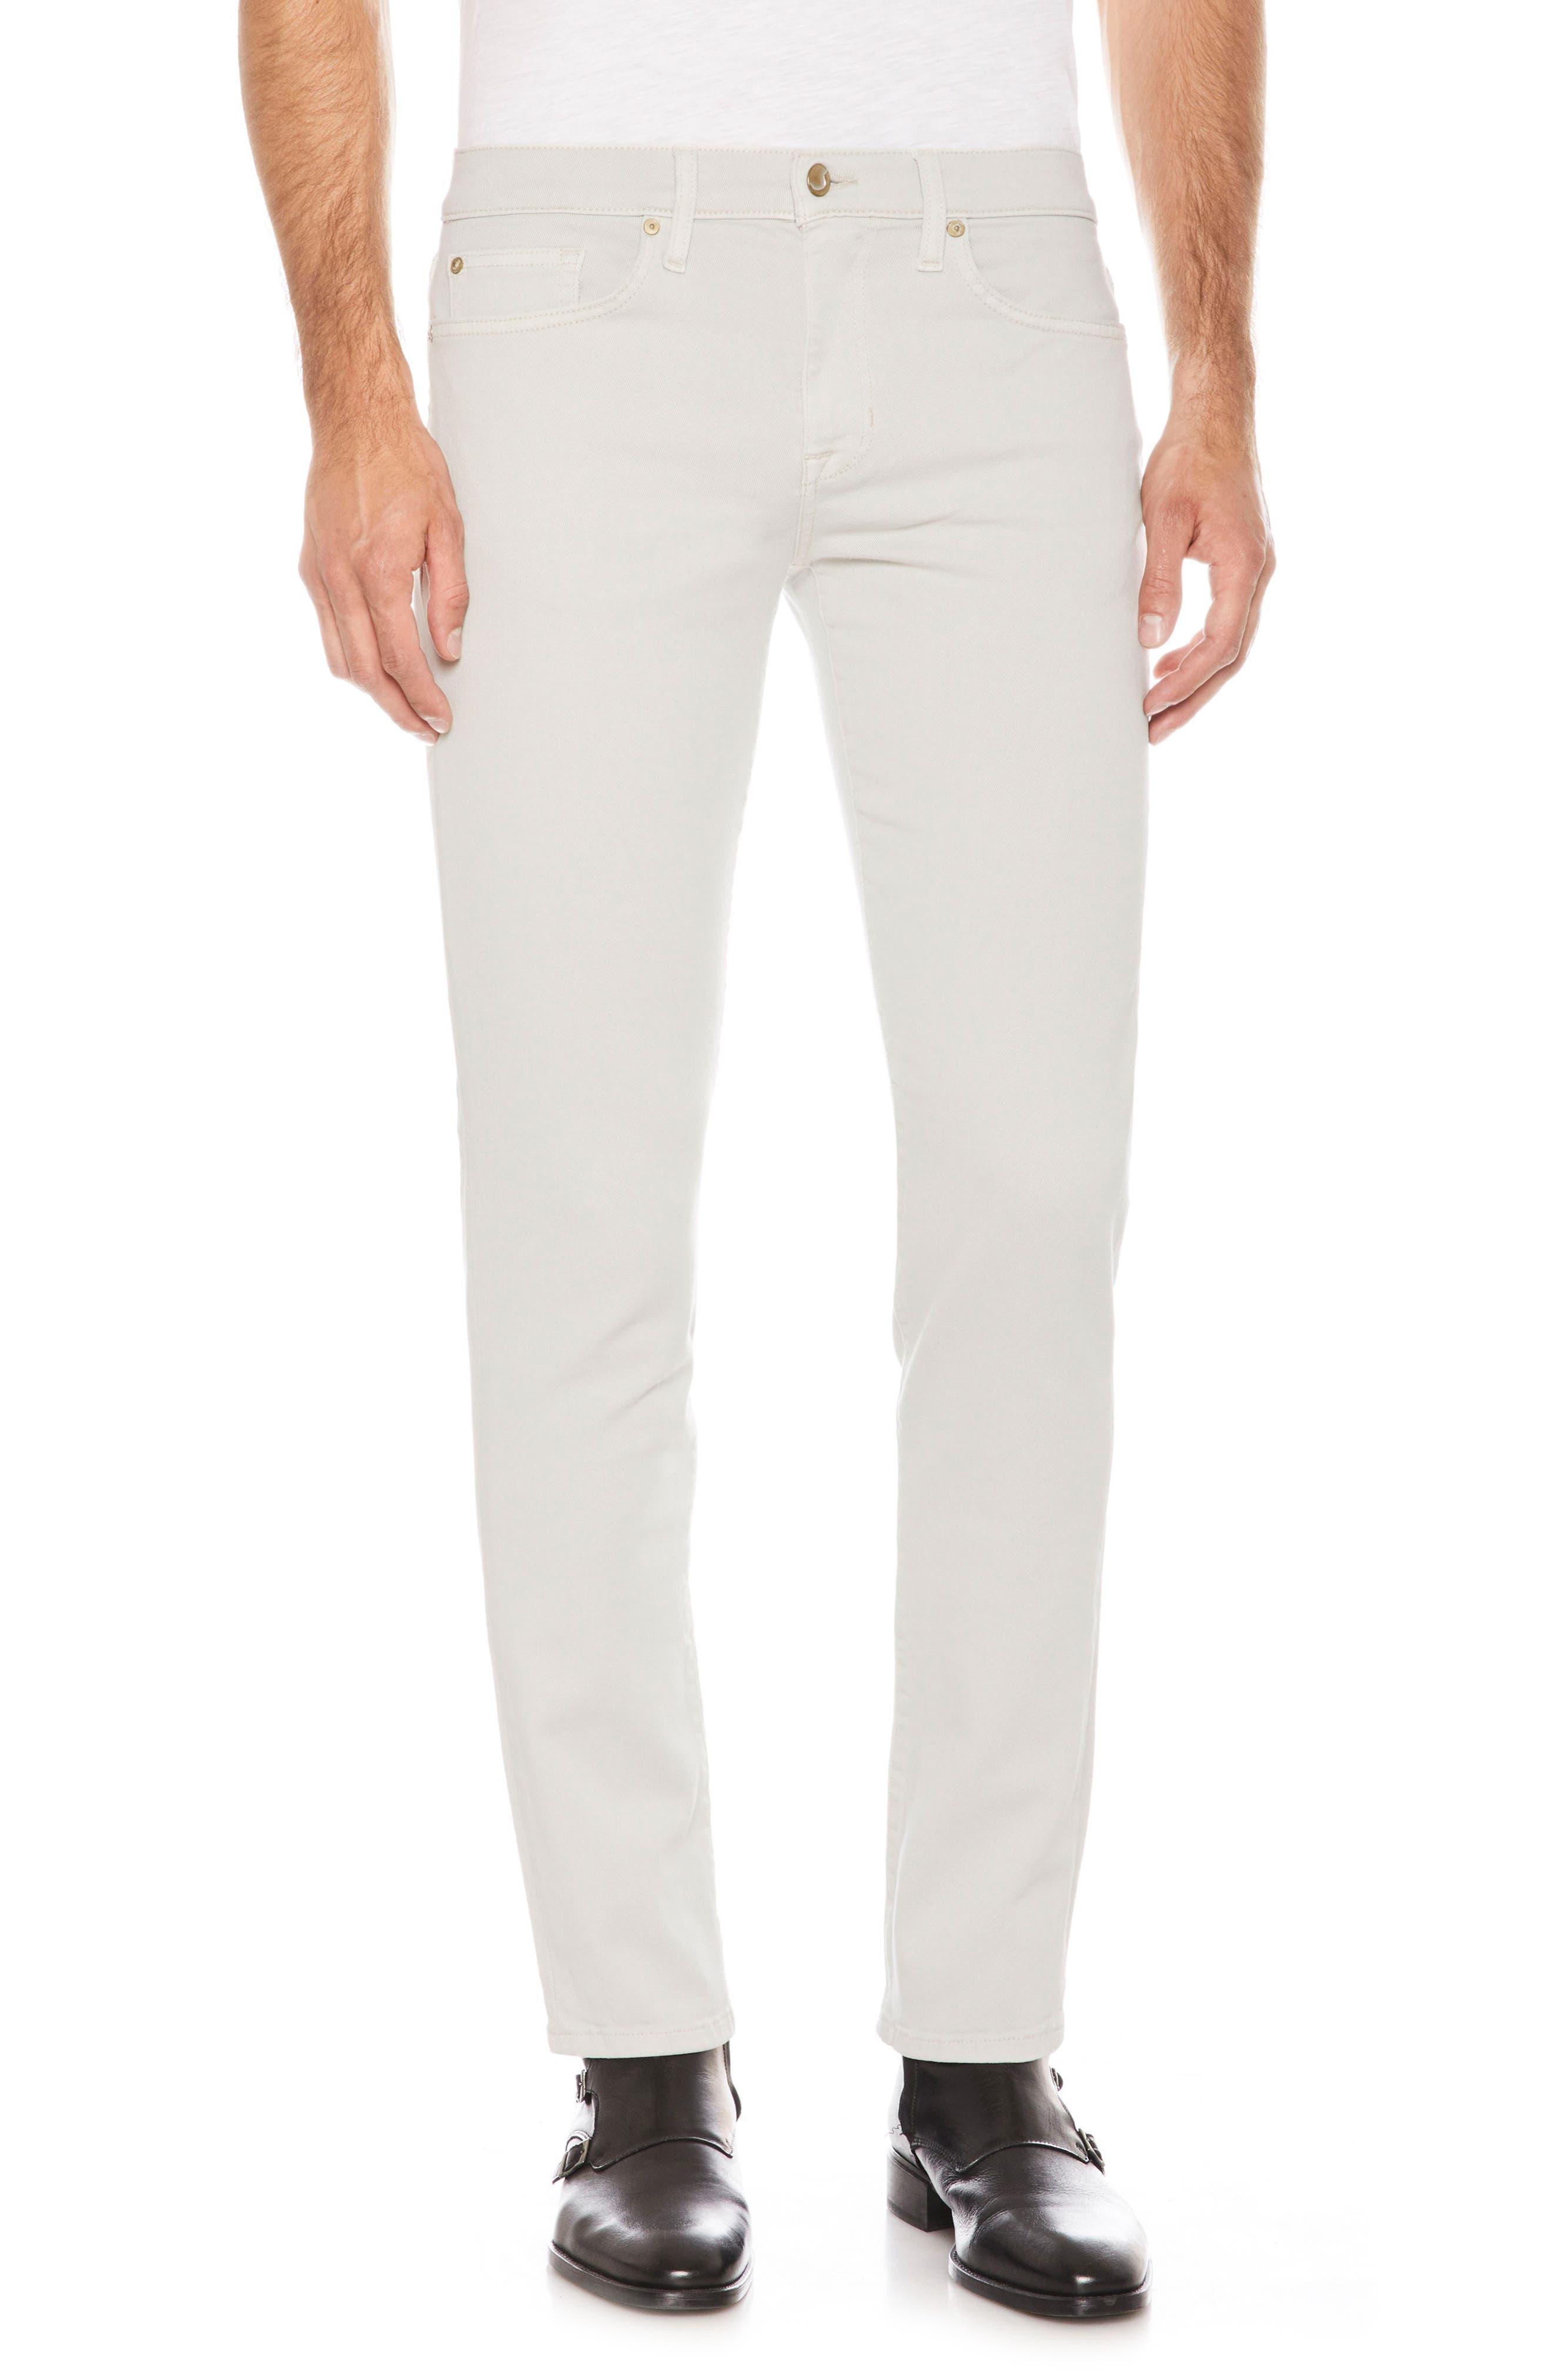 Brixton Slim Straight Leg Jeans,                         Main,                         color,